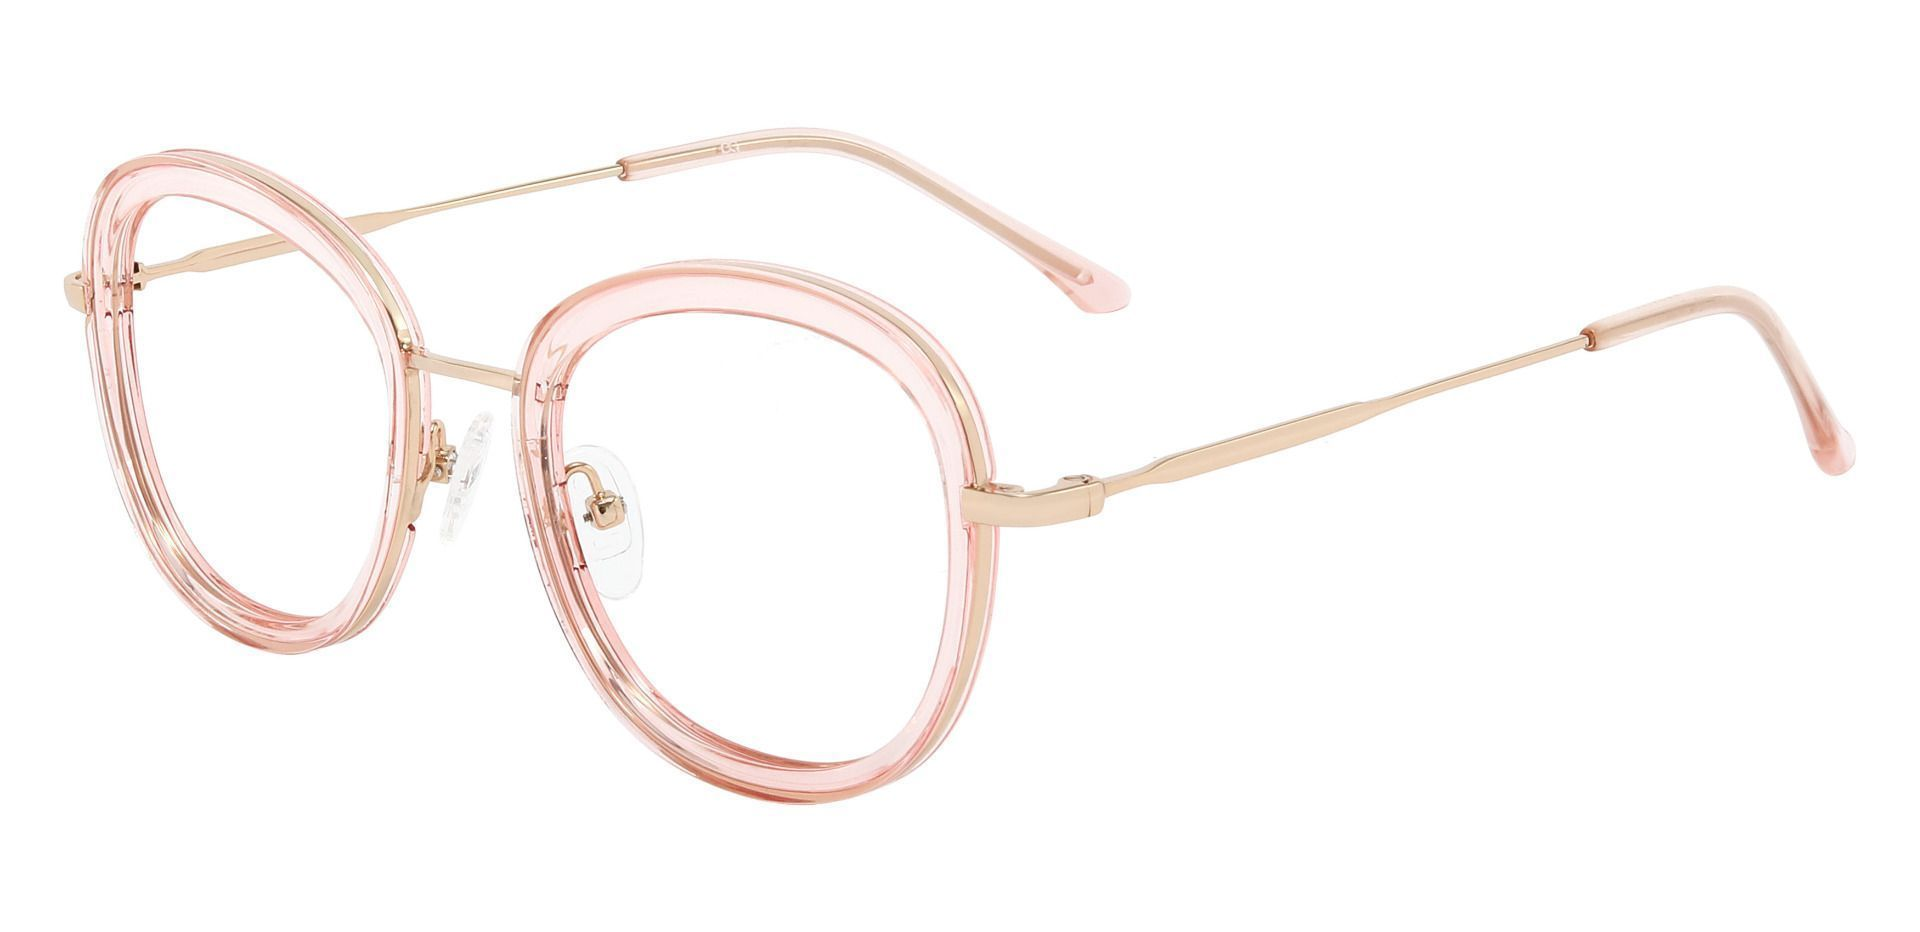 Bourbon Oval Prescription Glasses - Pink